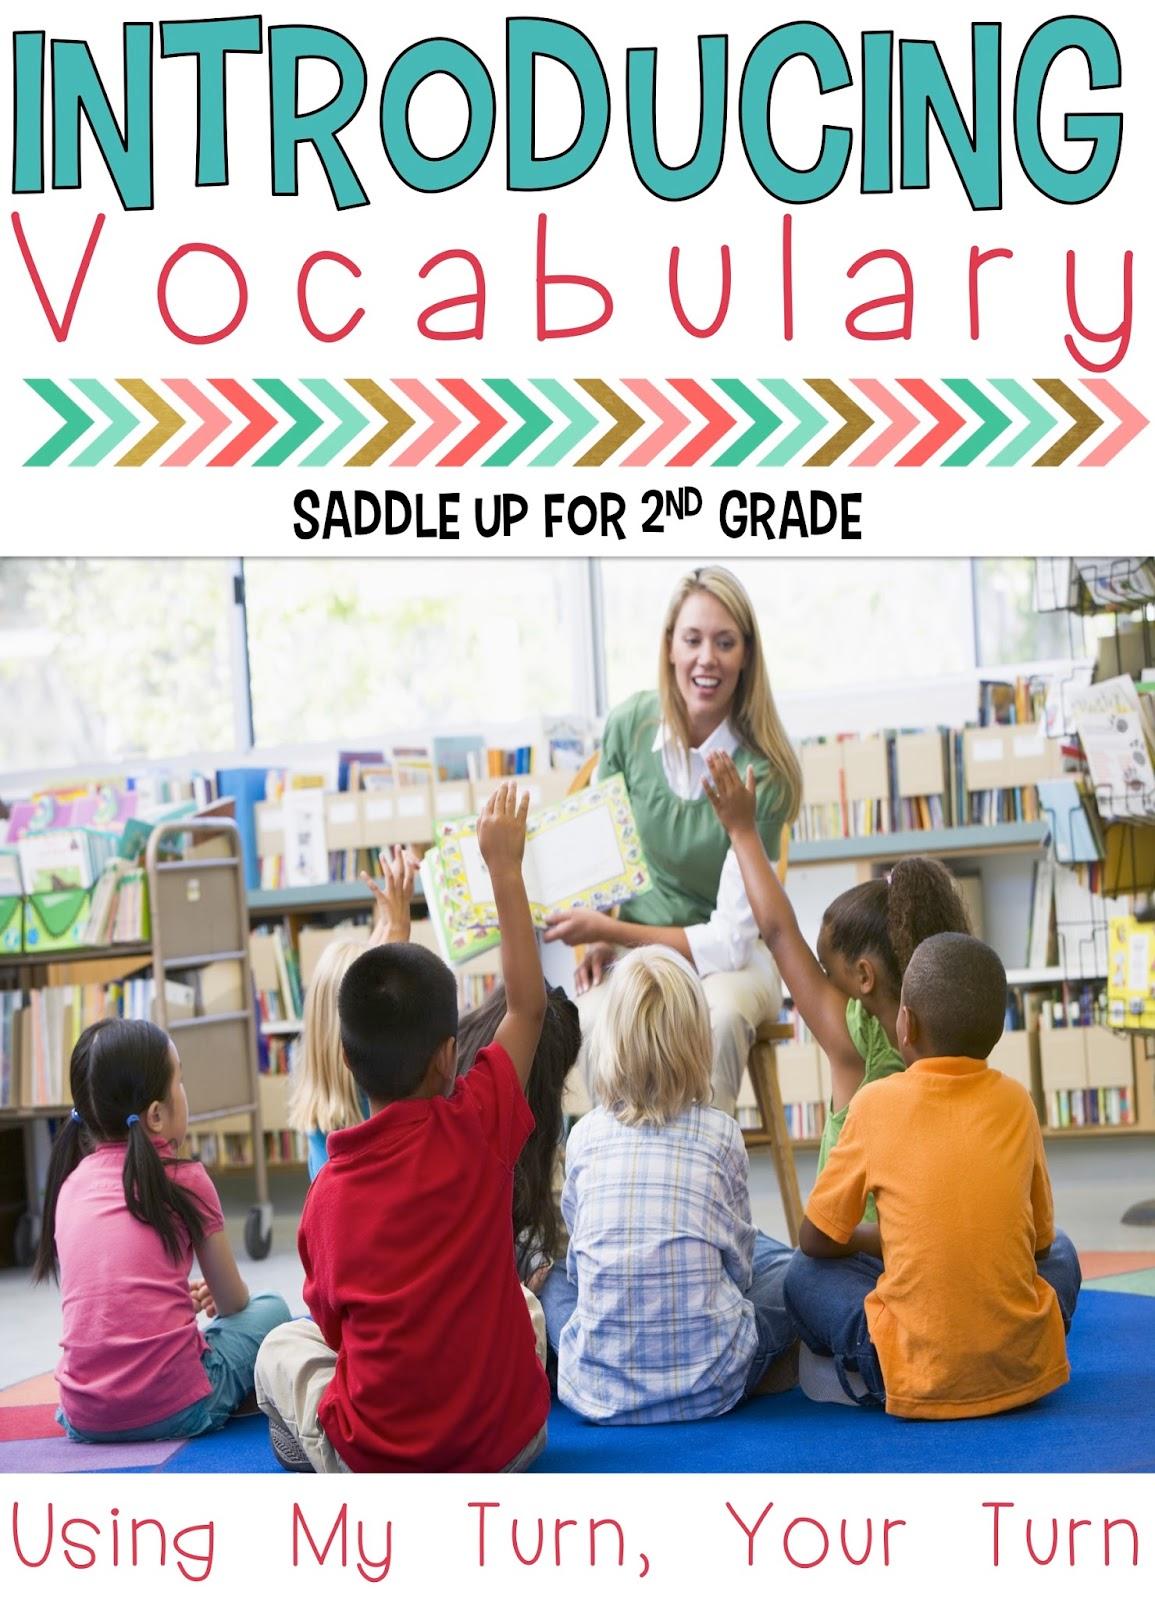 Introducing Vocabulary